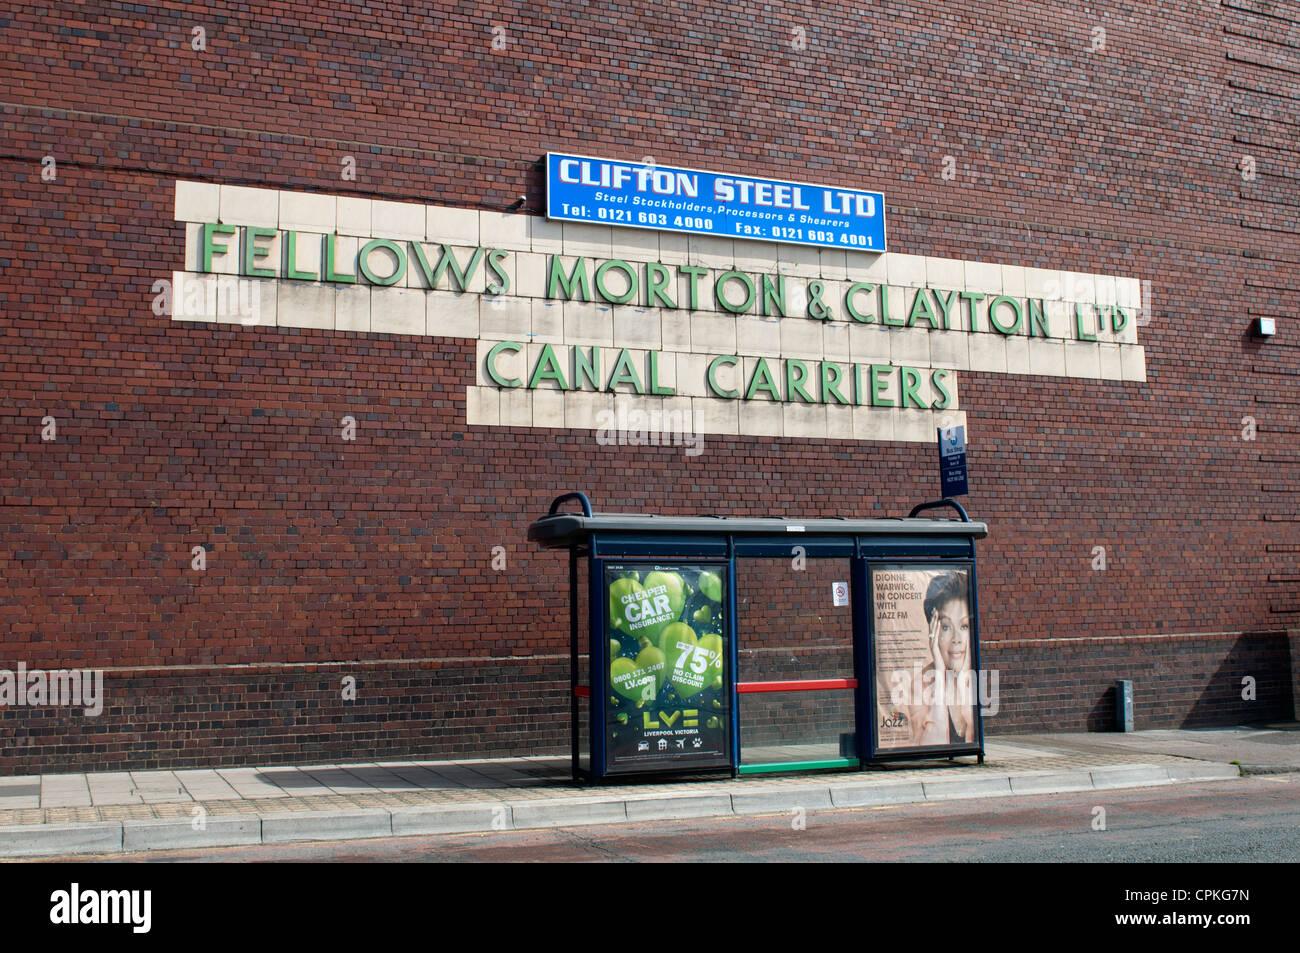 Fellows Morton and Clayton Ltd. building, Digbeth, Birmingham, UK - Stock Image